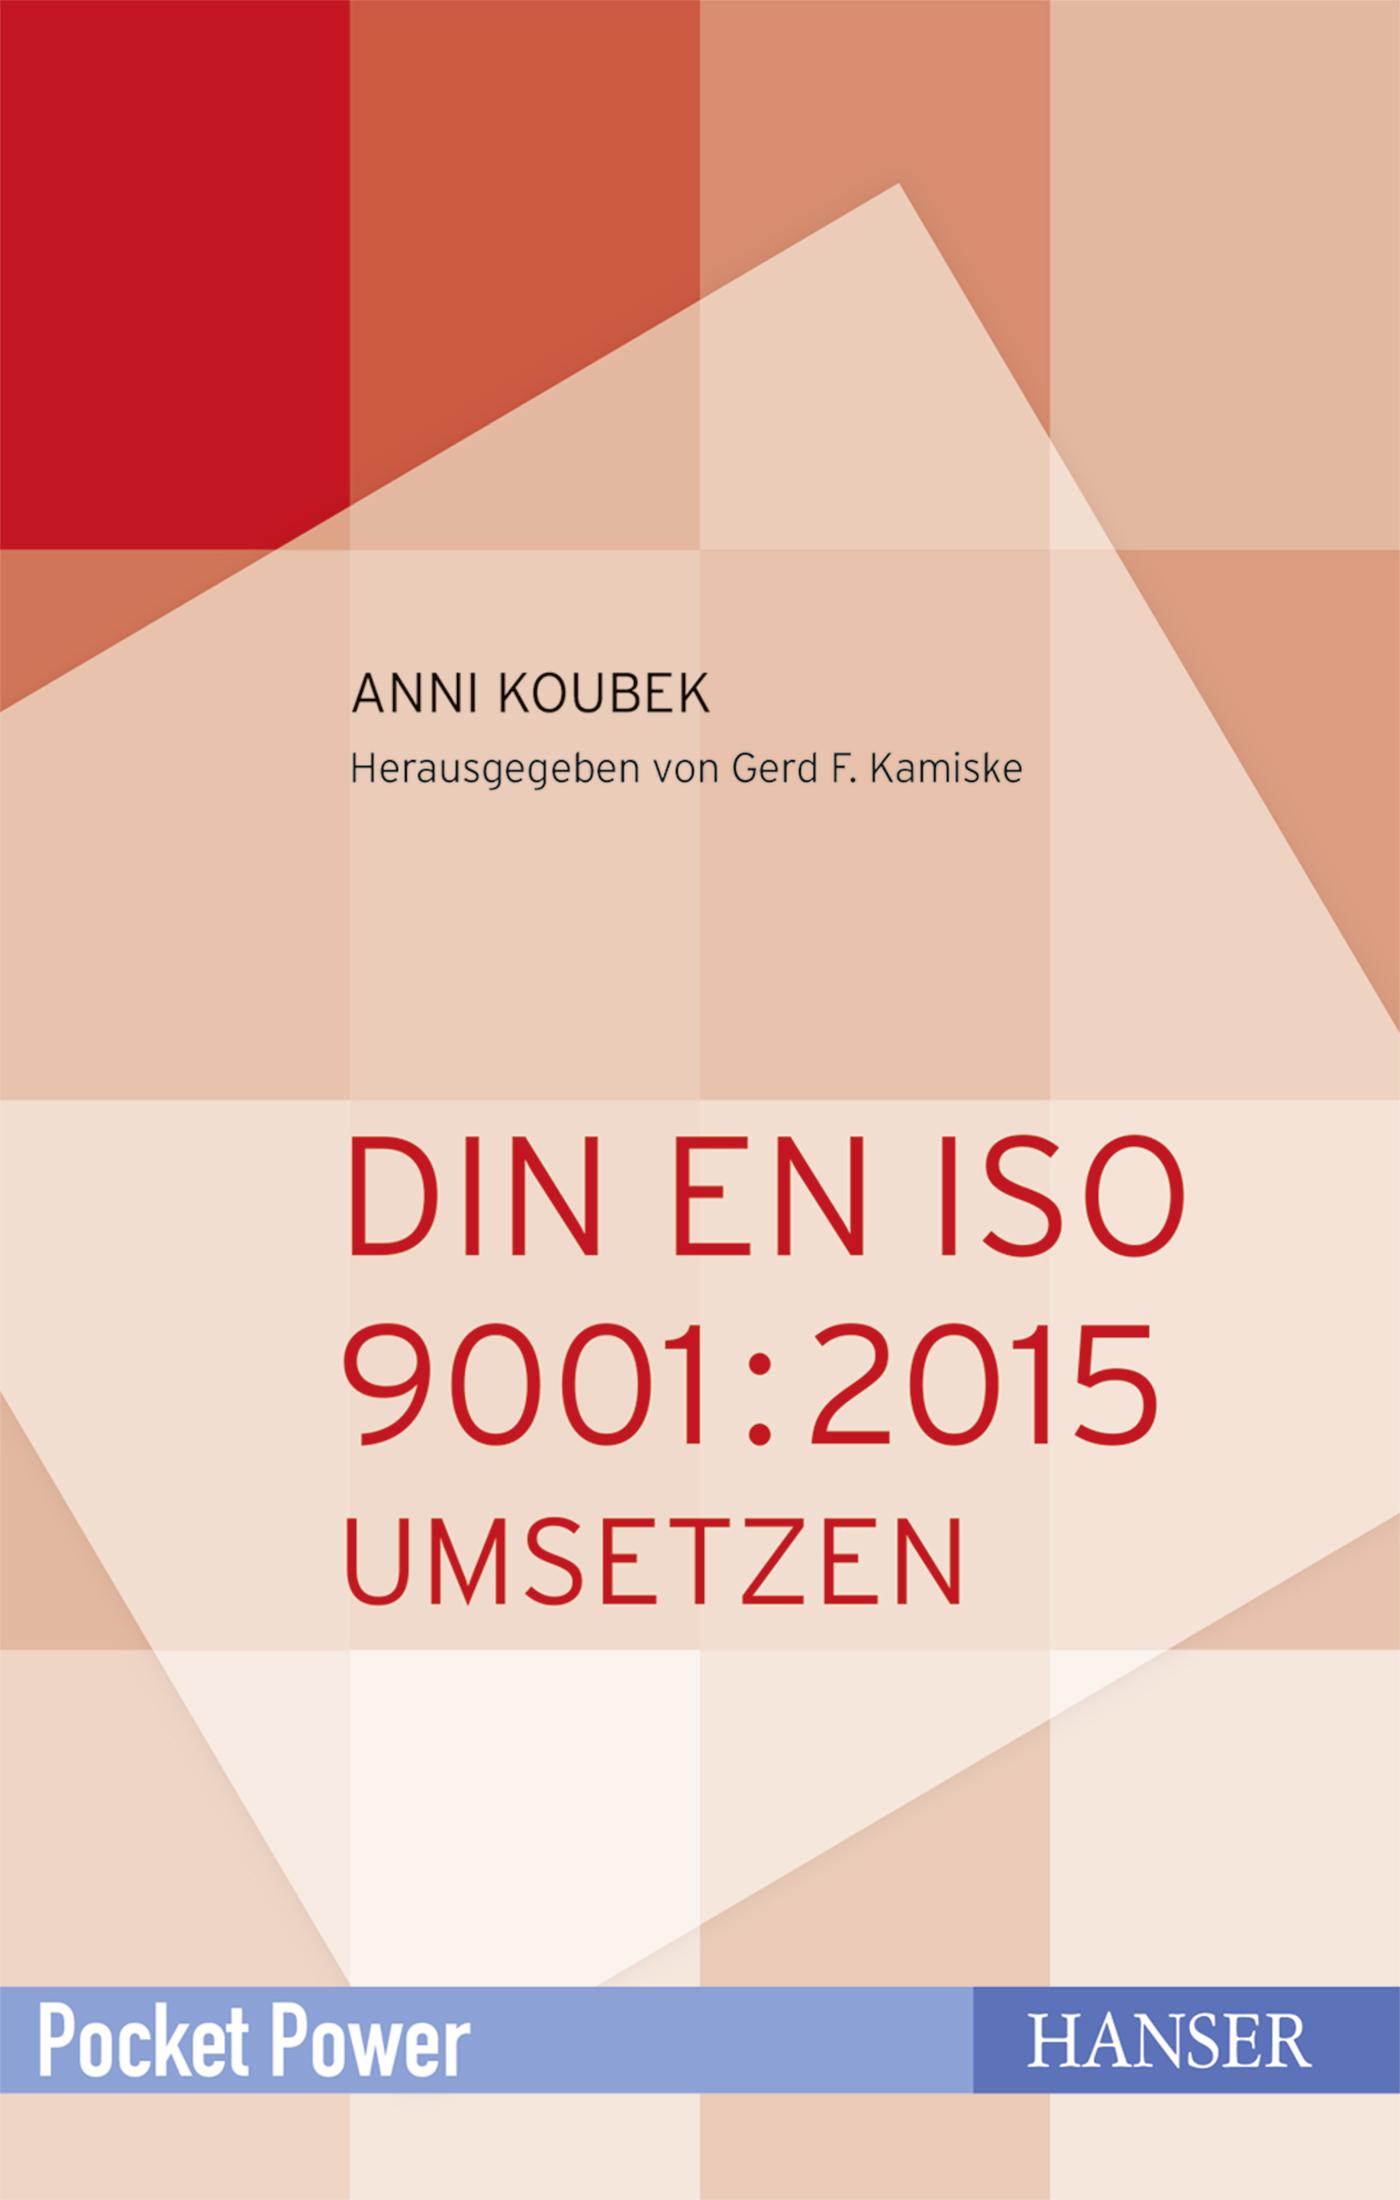 Koubek, DIN EN ISO 9001:2015 umsetzen, 978-3-446-45199-5